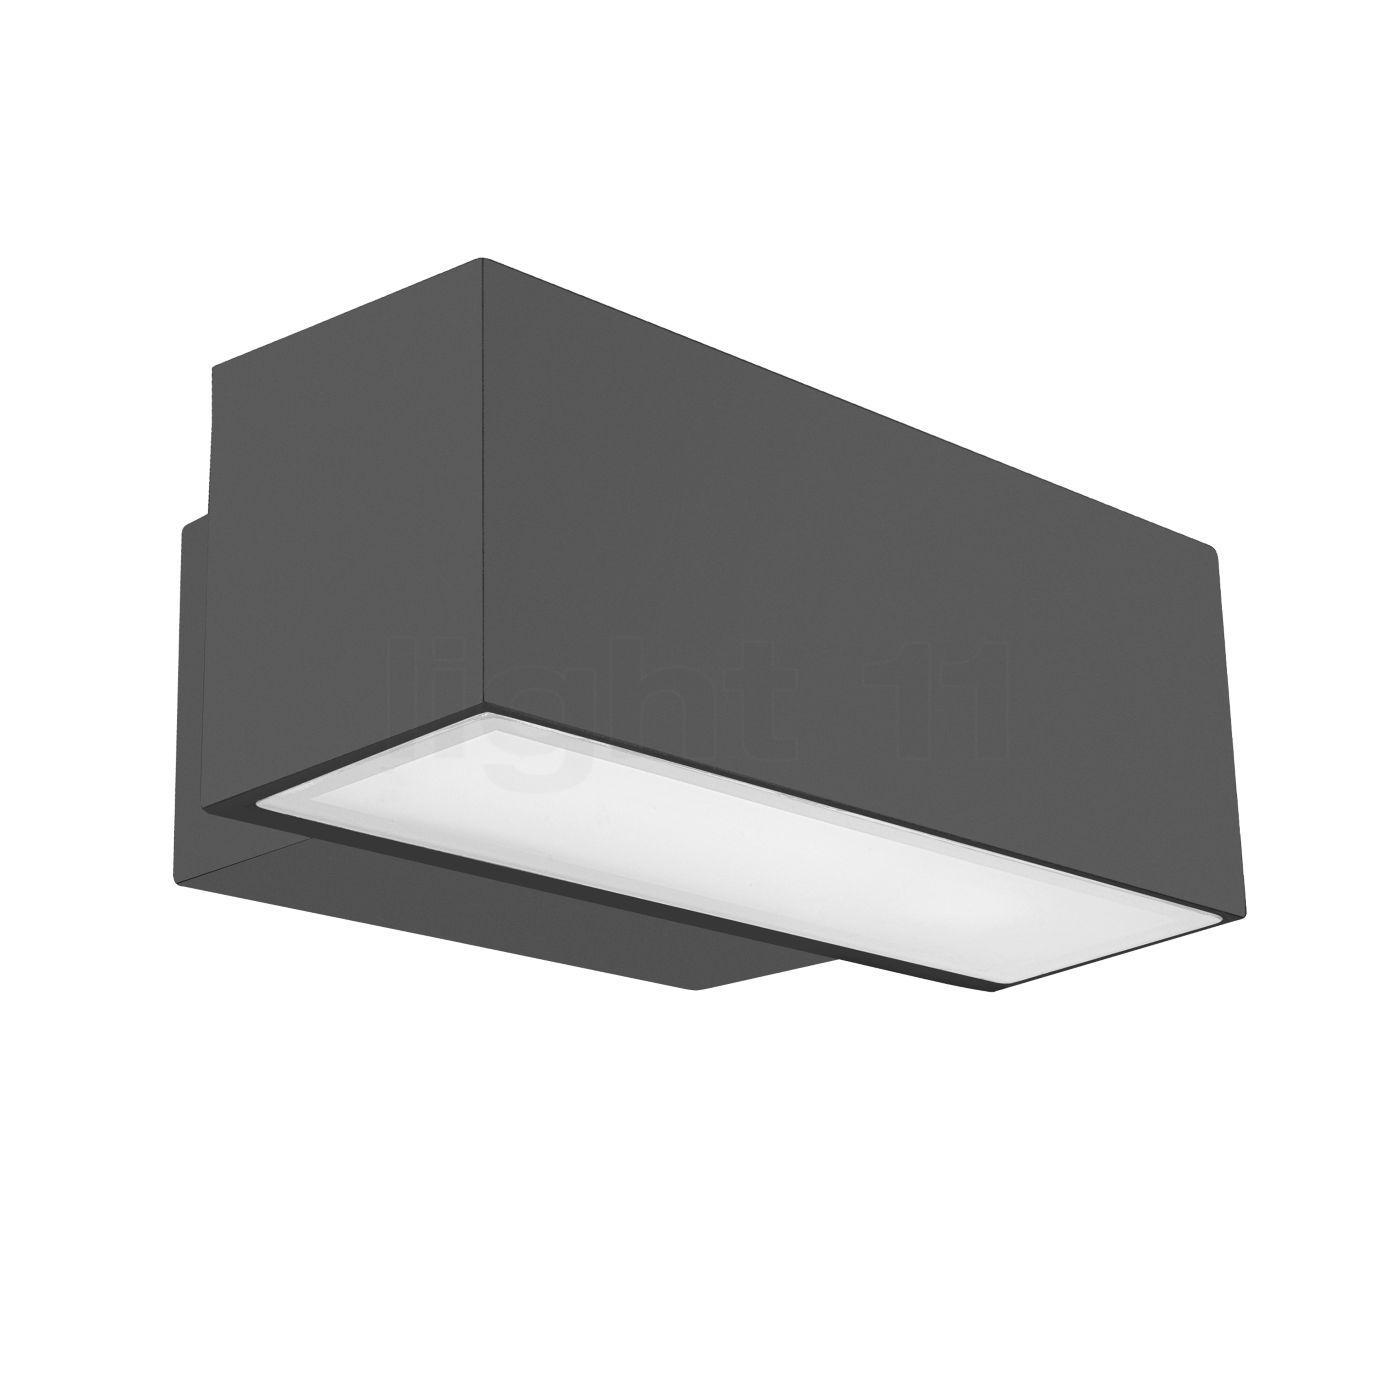 LEDS-C4 Afrodita 19W Wandleuchte LED, anthrazit 05-9879-Z5-CL